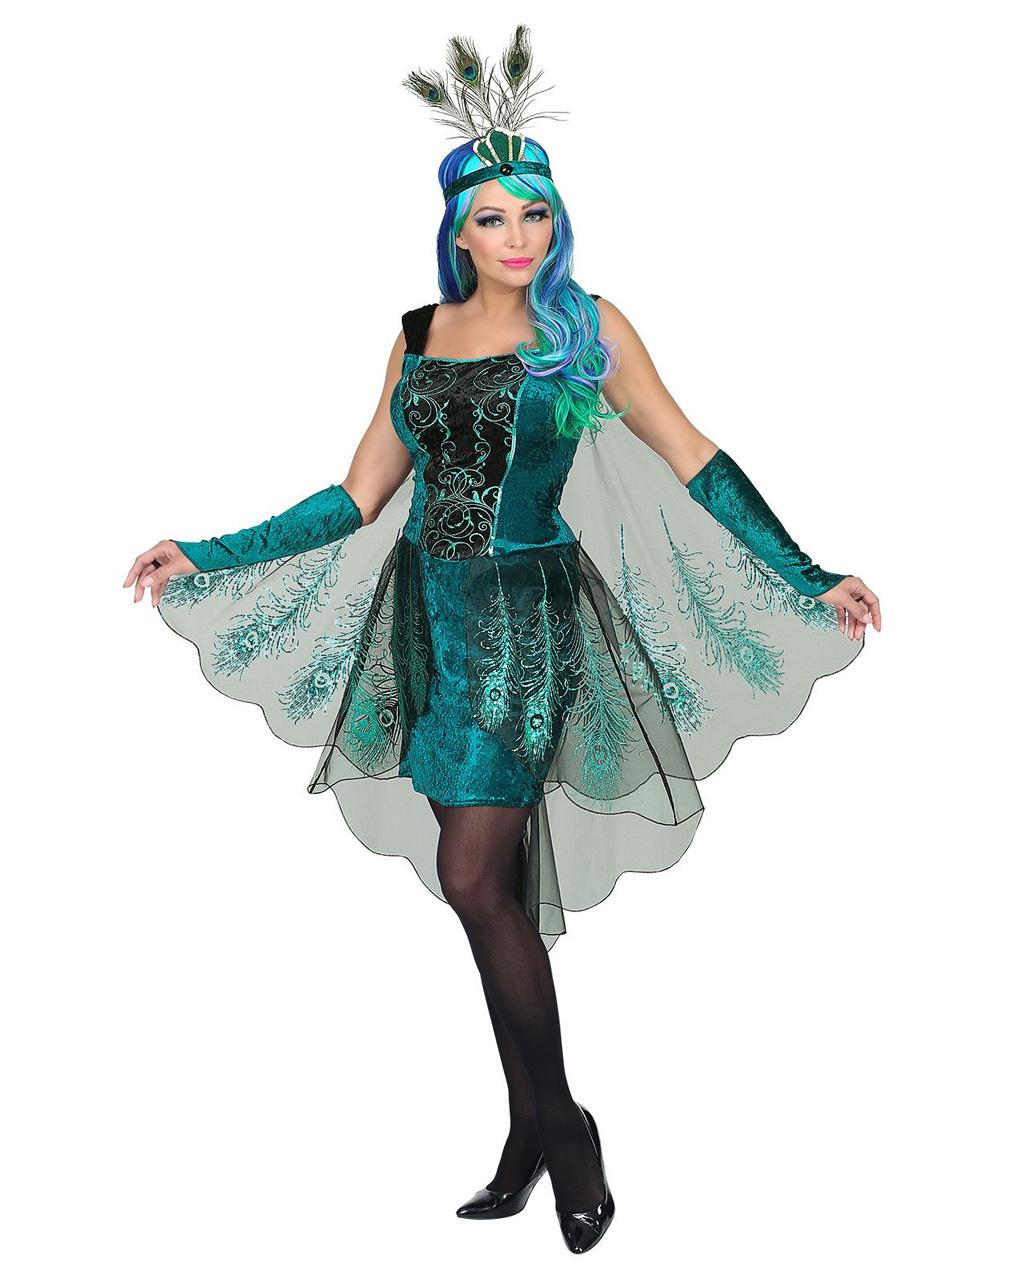 Pfauen Fee Kostüm Mit Kopfschmuck Märchenkostüm Horror Shopcom